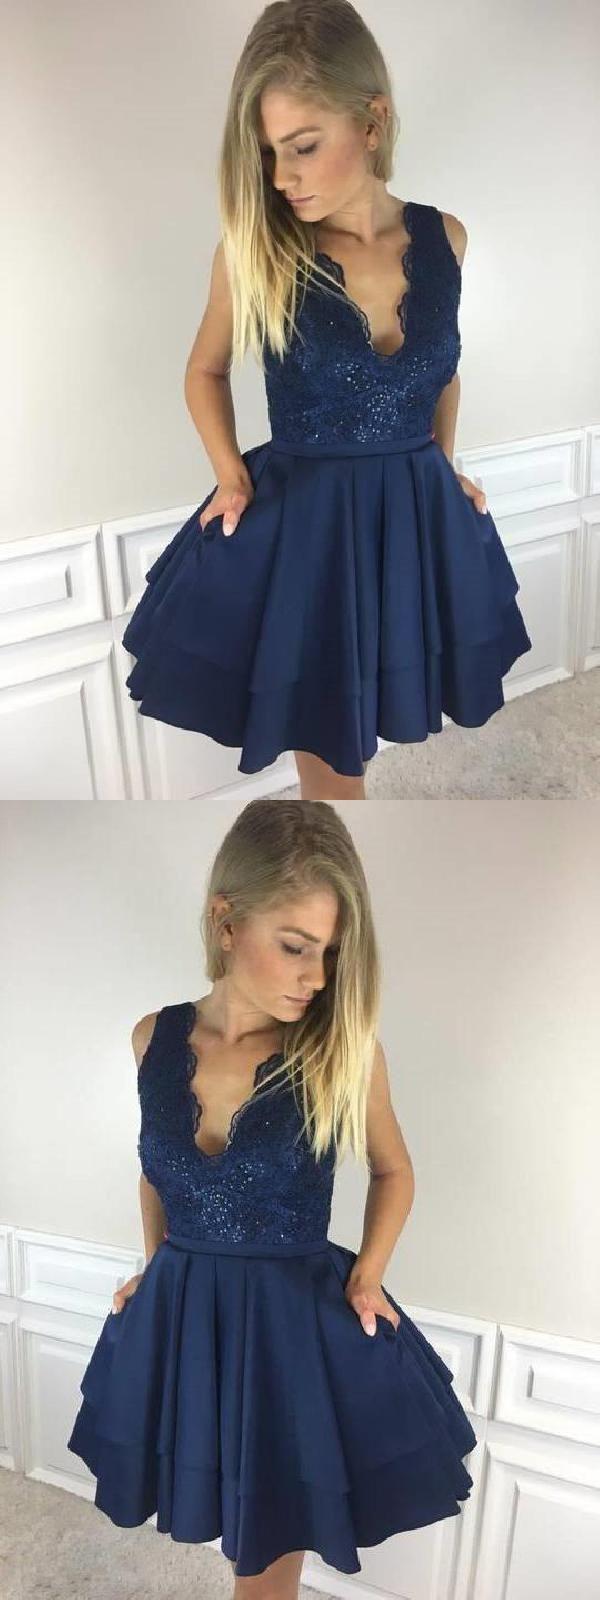 Aline short v neck dark blue seve homecoming dresses